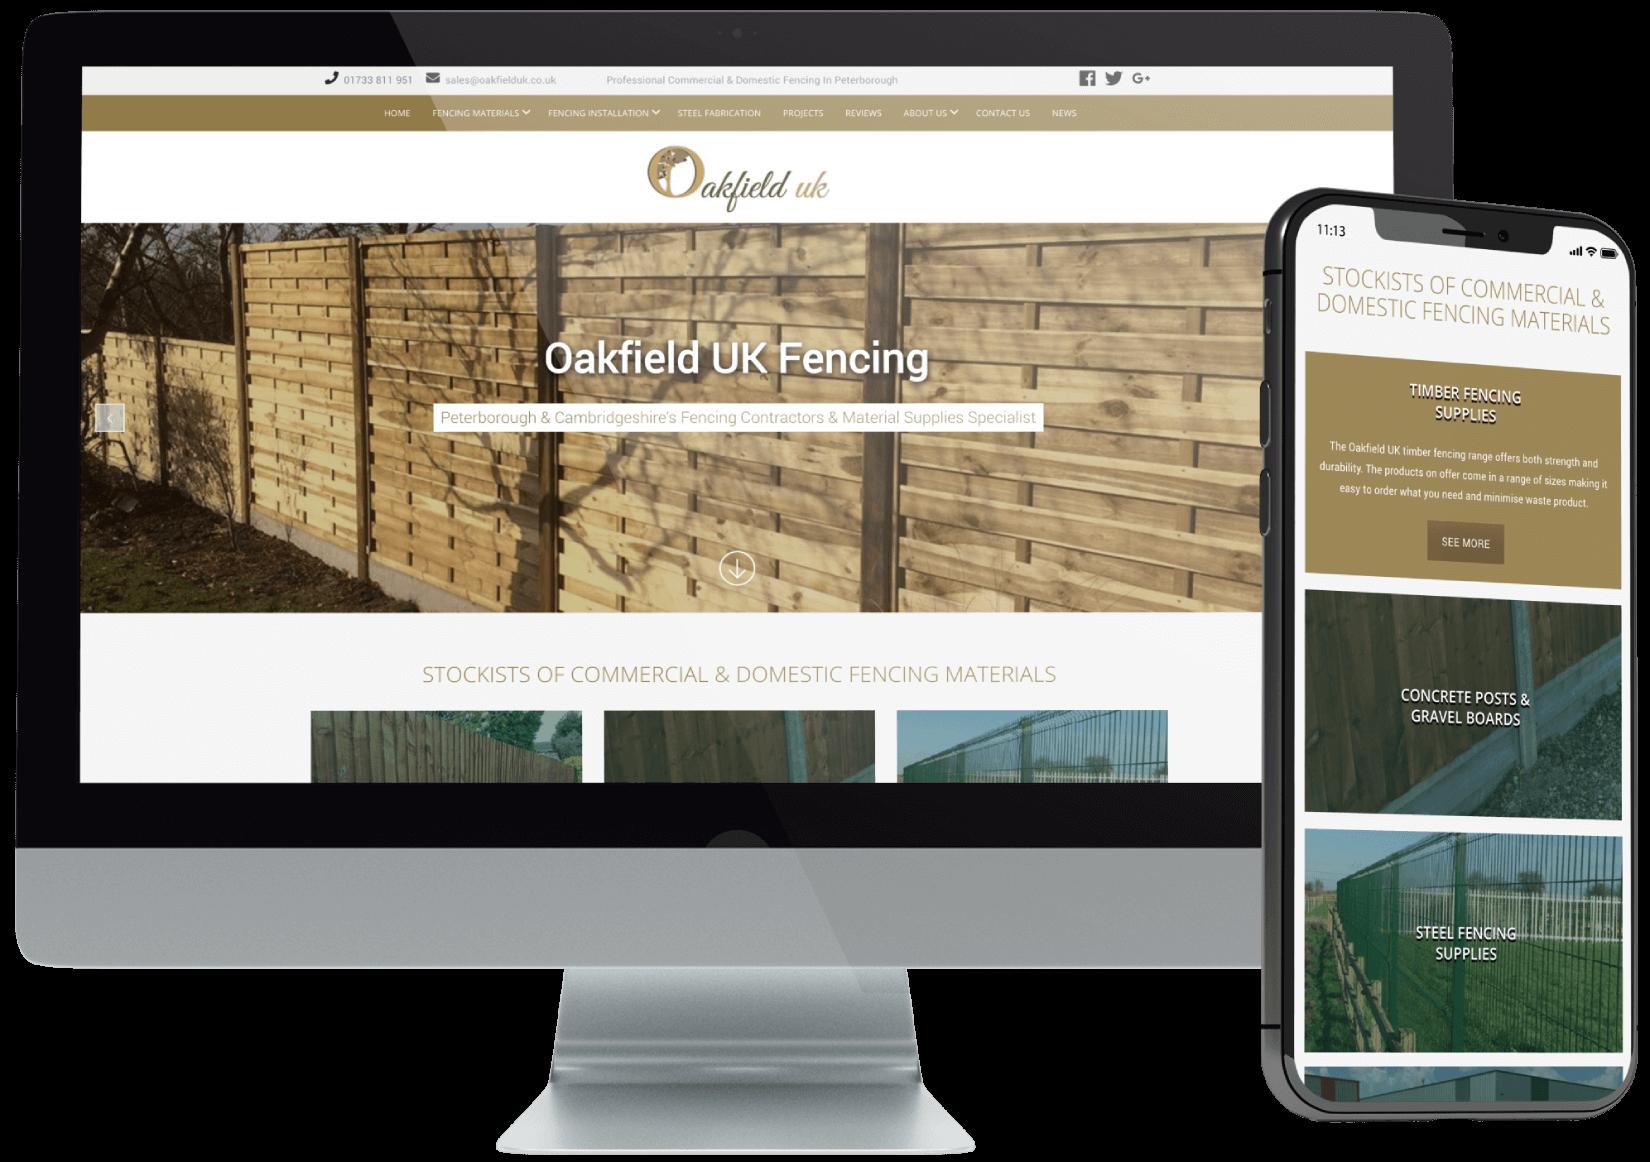 Oakfield UK Fencing Website